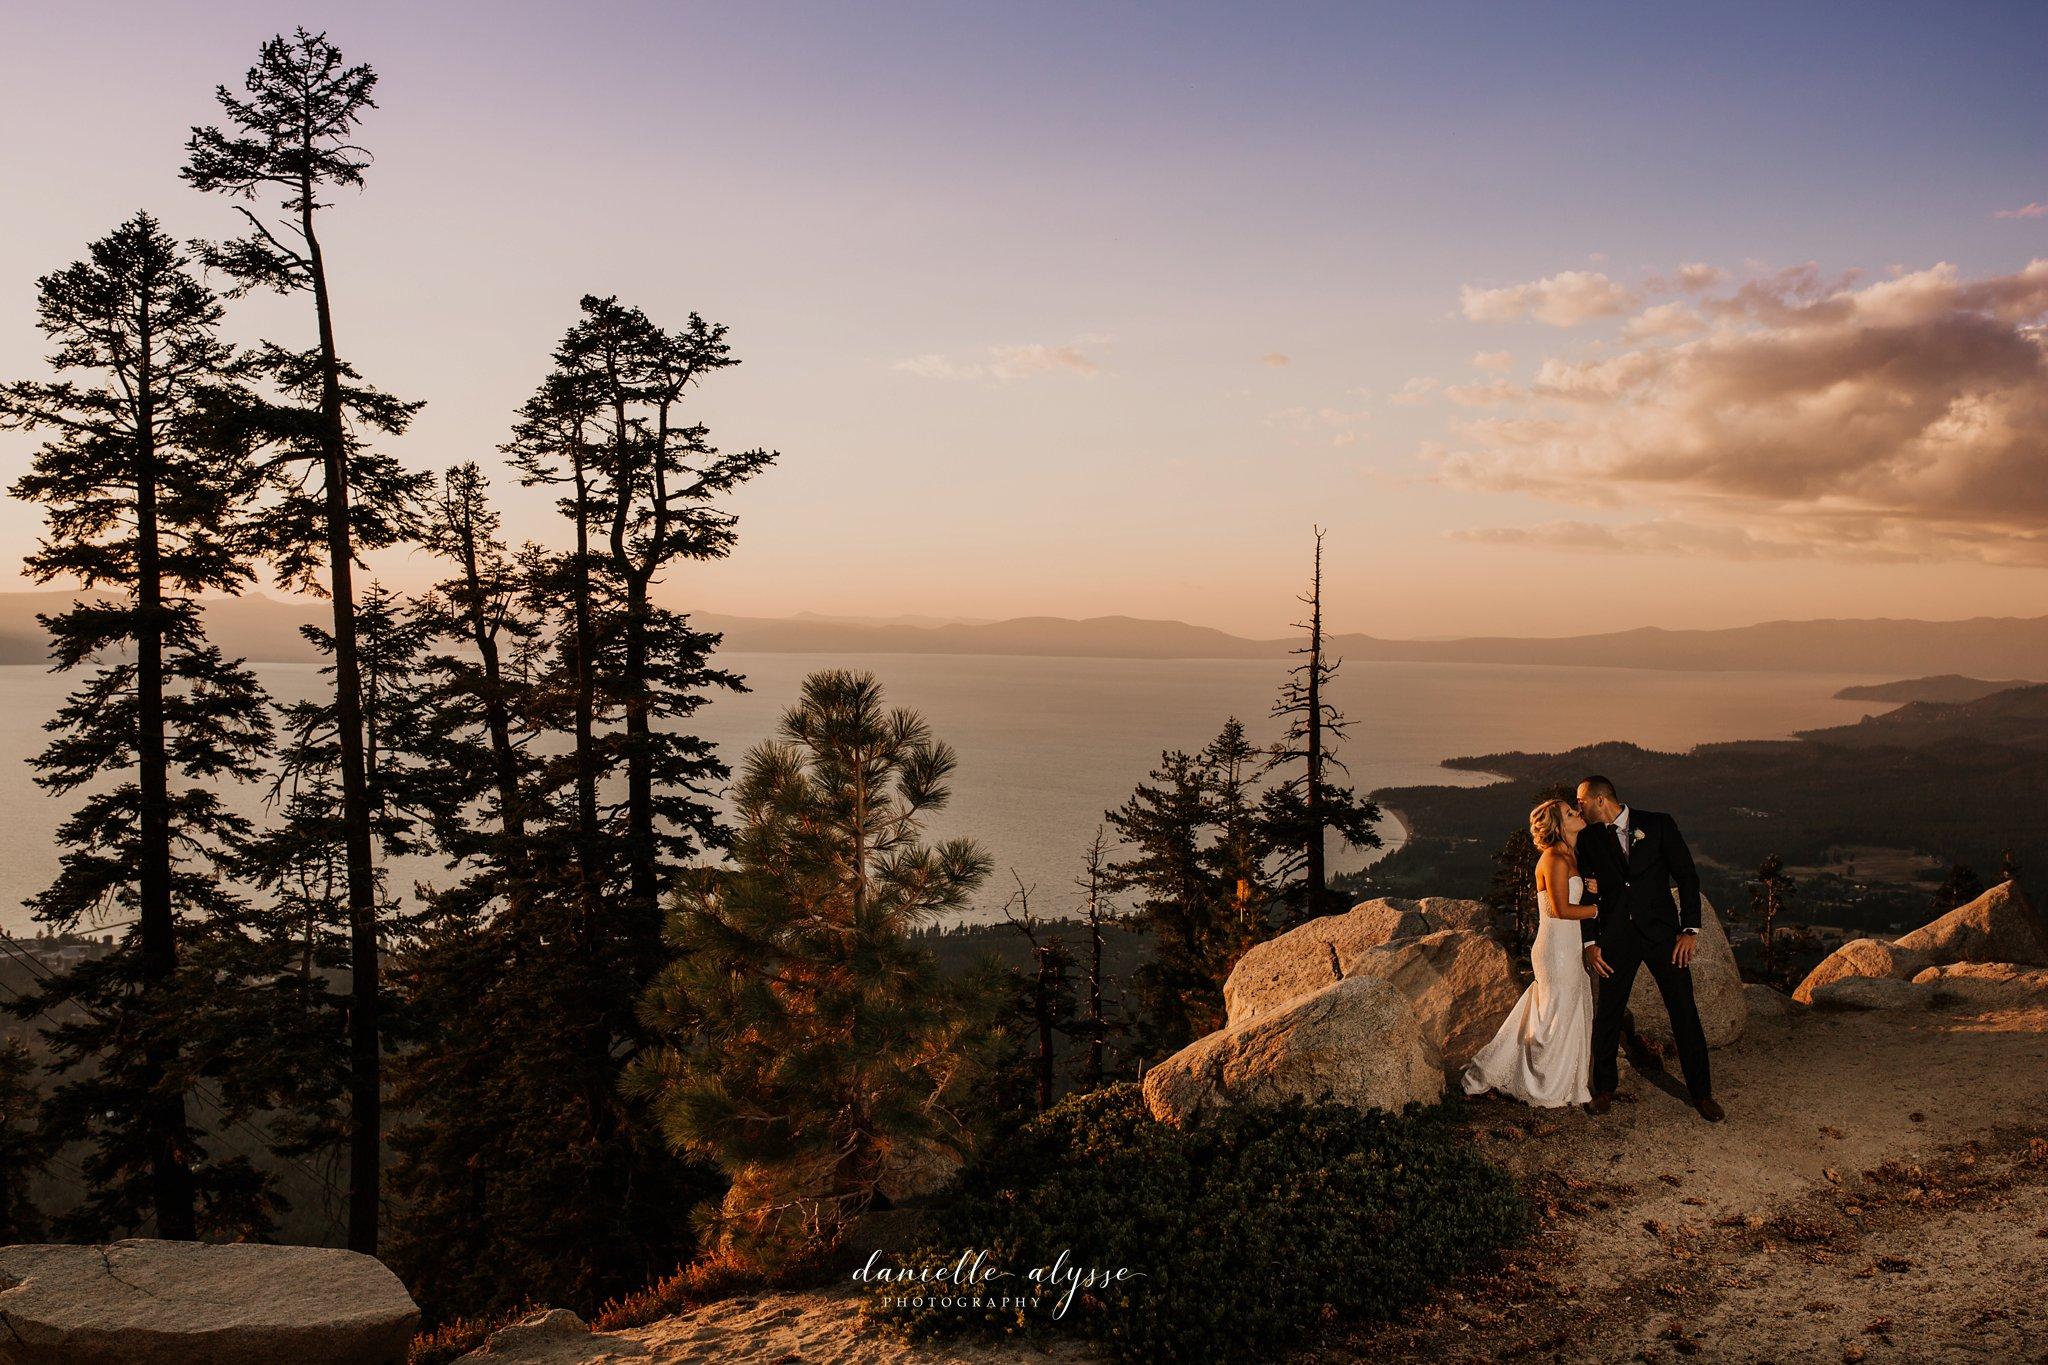 180831_wedding_stephanie_heavenly_south_lake_tahoe_danielle_alysse_photography_destination_blog_1018_WEB.jpg